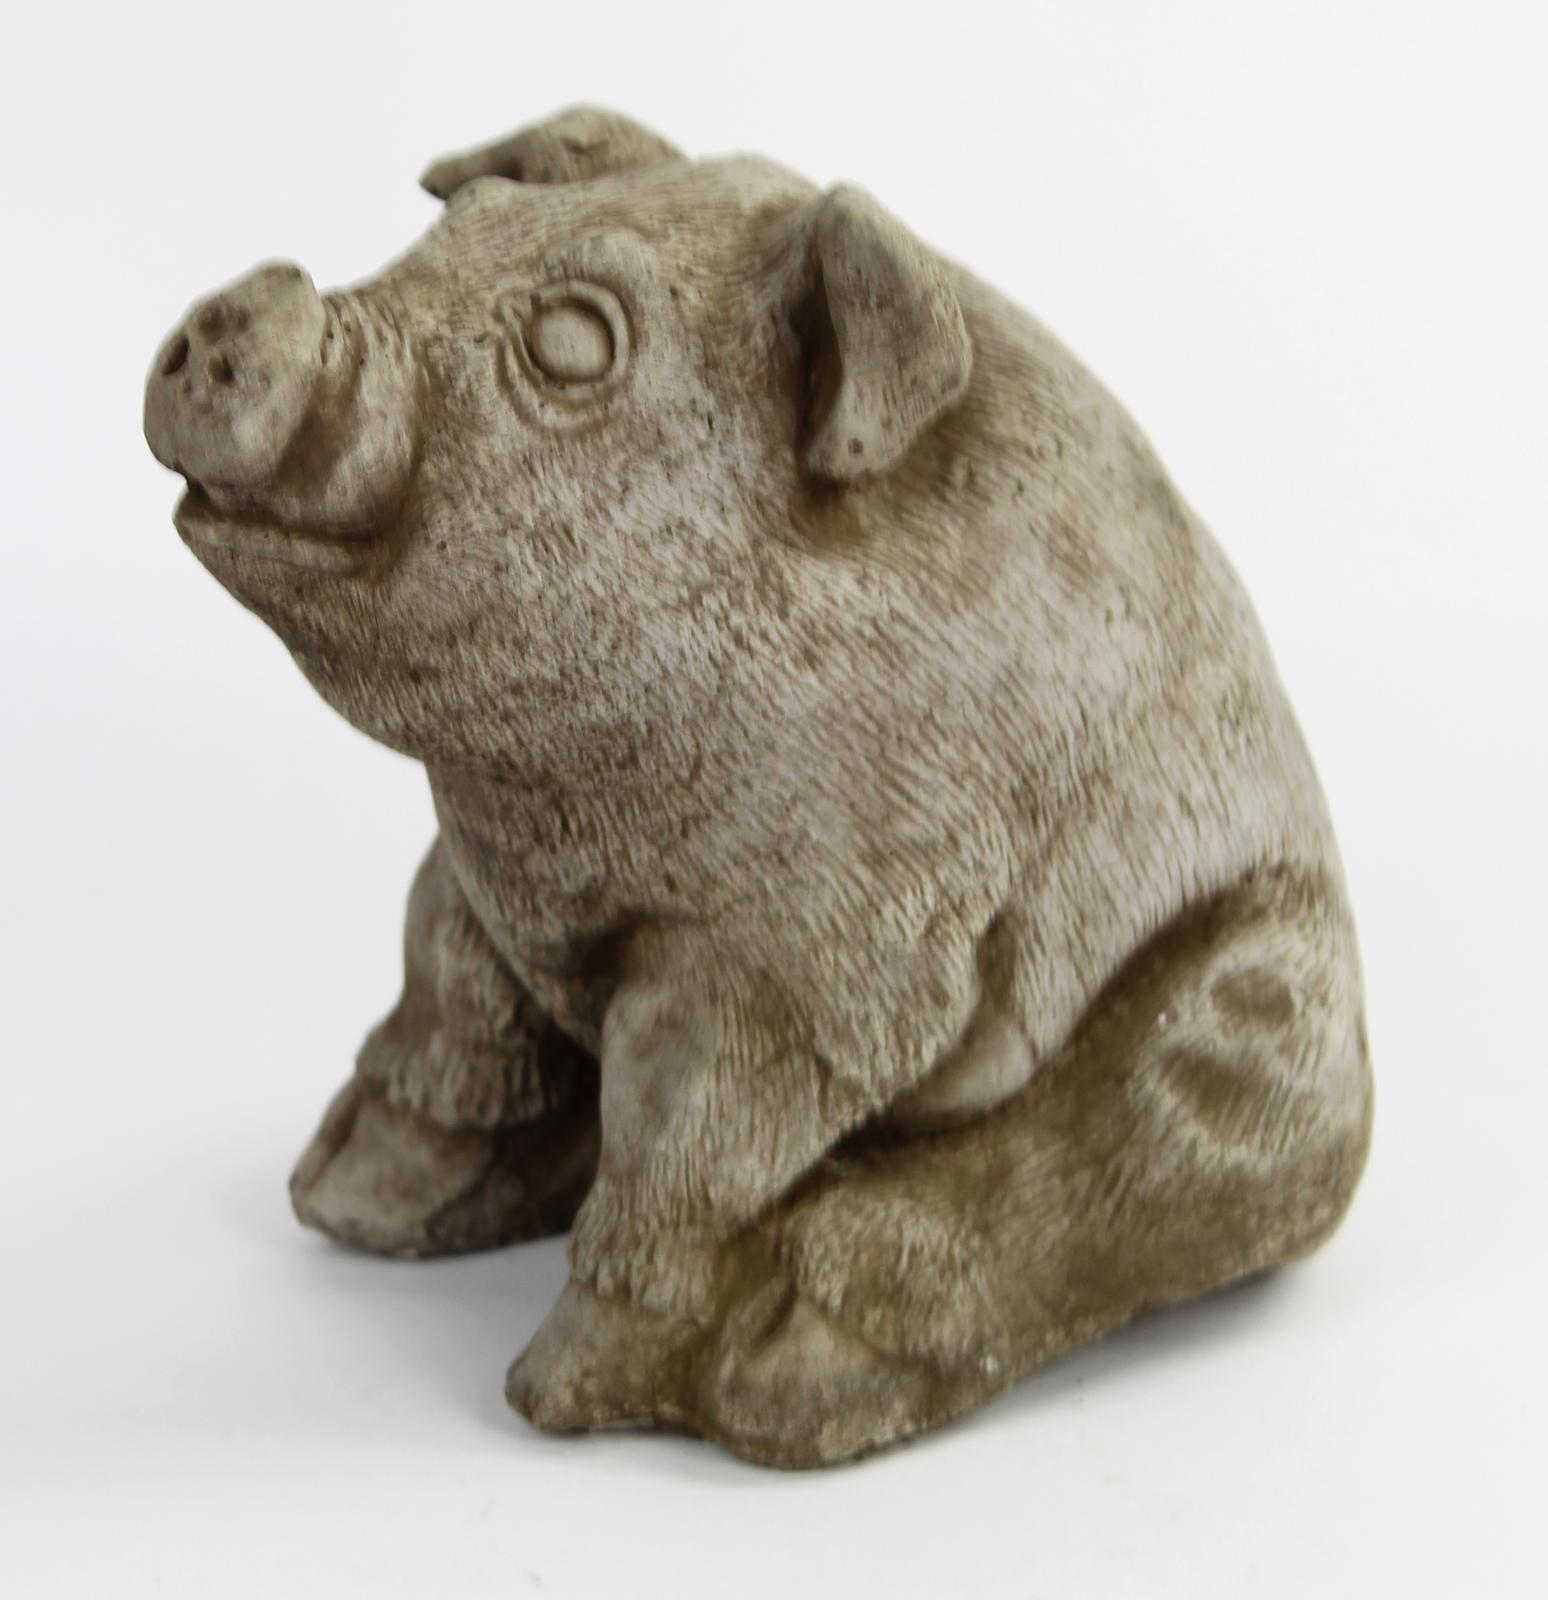 Pig Concrete Statue